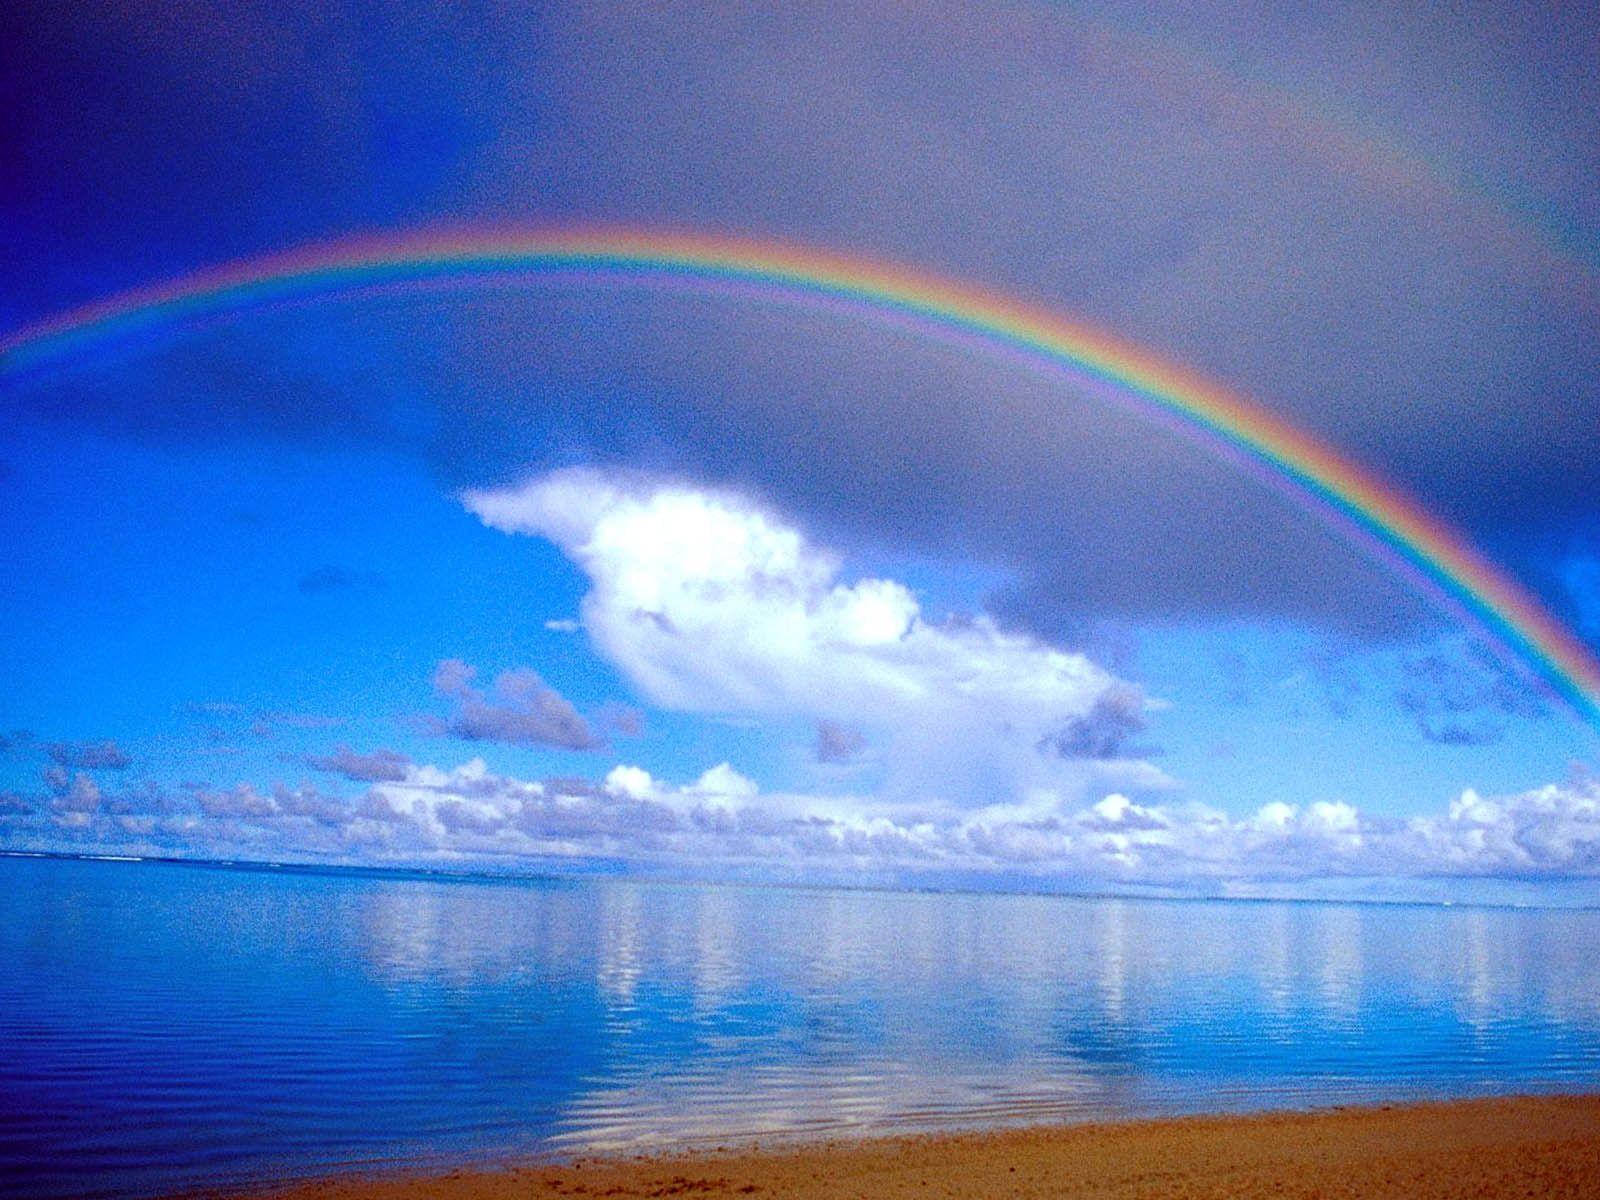 Beach Clouds Rainbow Sea Sky 720p Wallpaper Hdwallpaper Desktop Clouds Rainbow Wallpaper Scenic Pictures